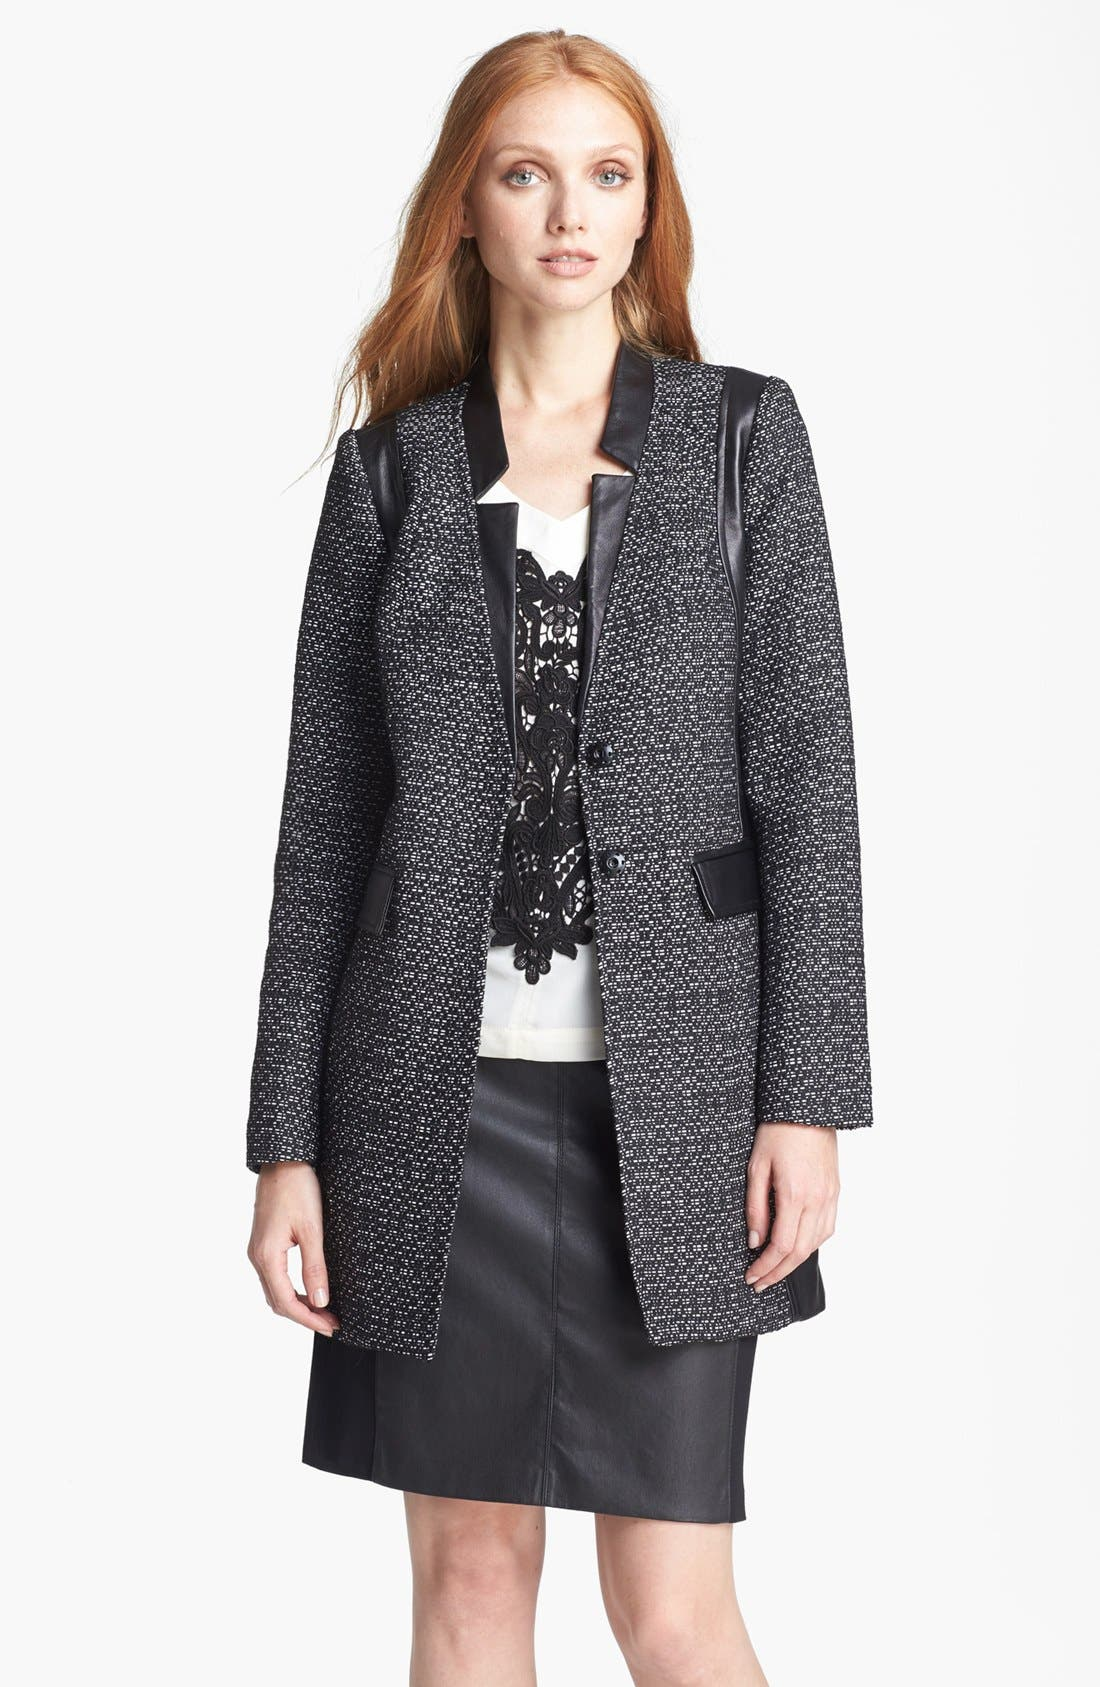 Alternate Image 1 Selected - Nanette Lepore 'Big Top' Tweed & Leather Coat